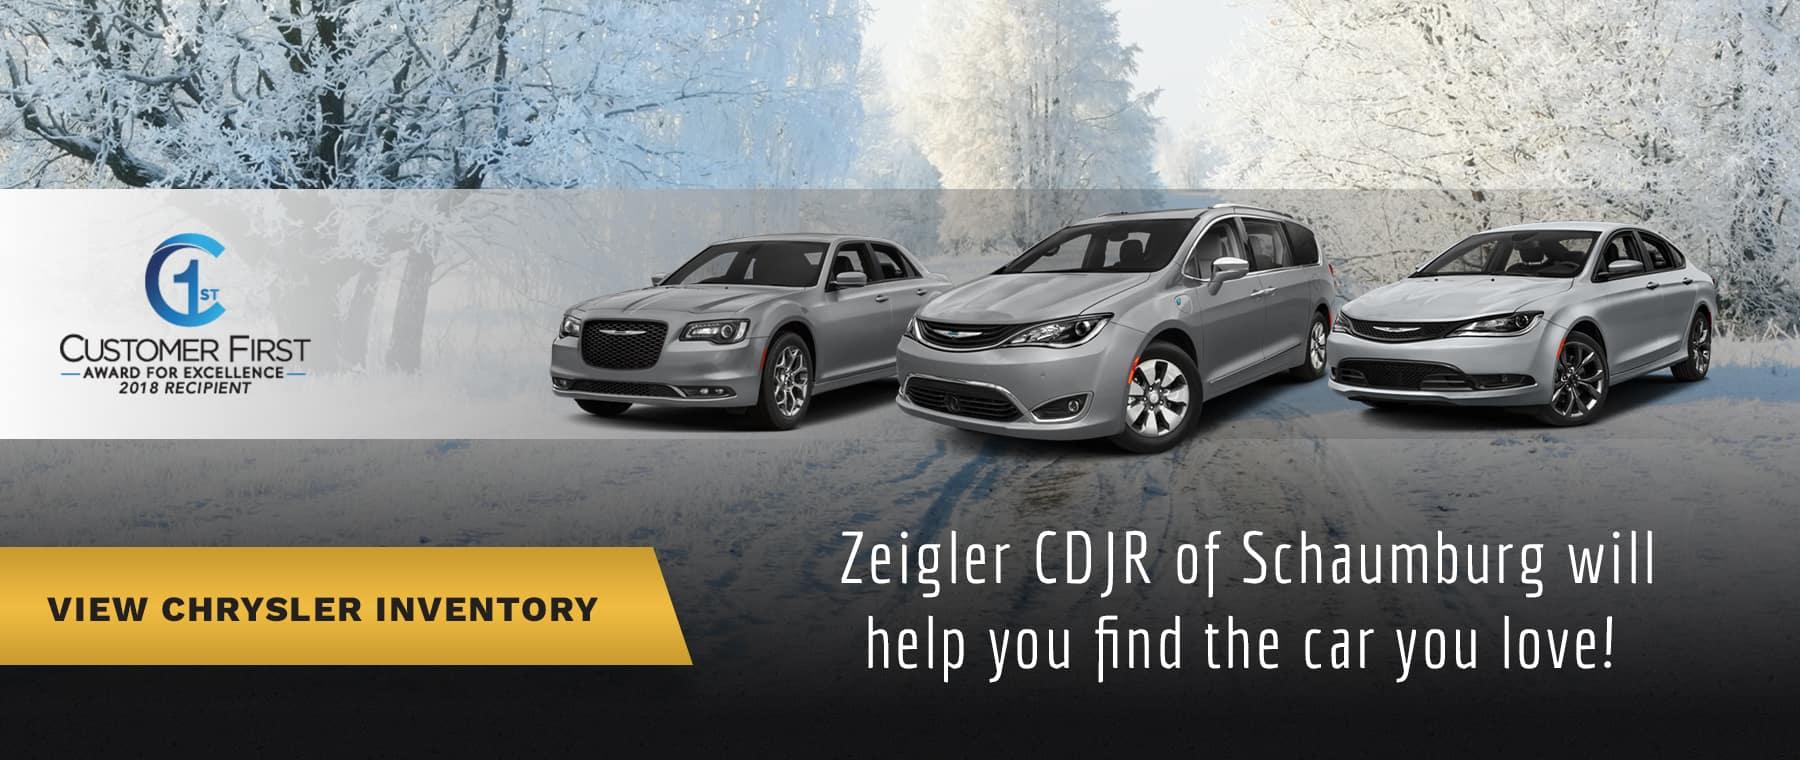 Customer First Chrysler Image